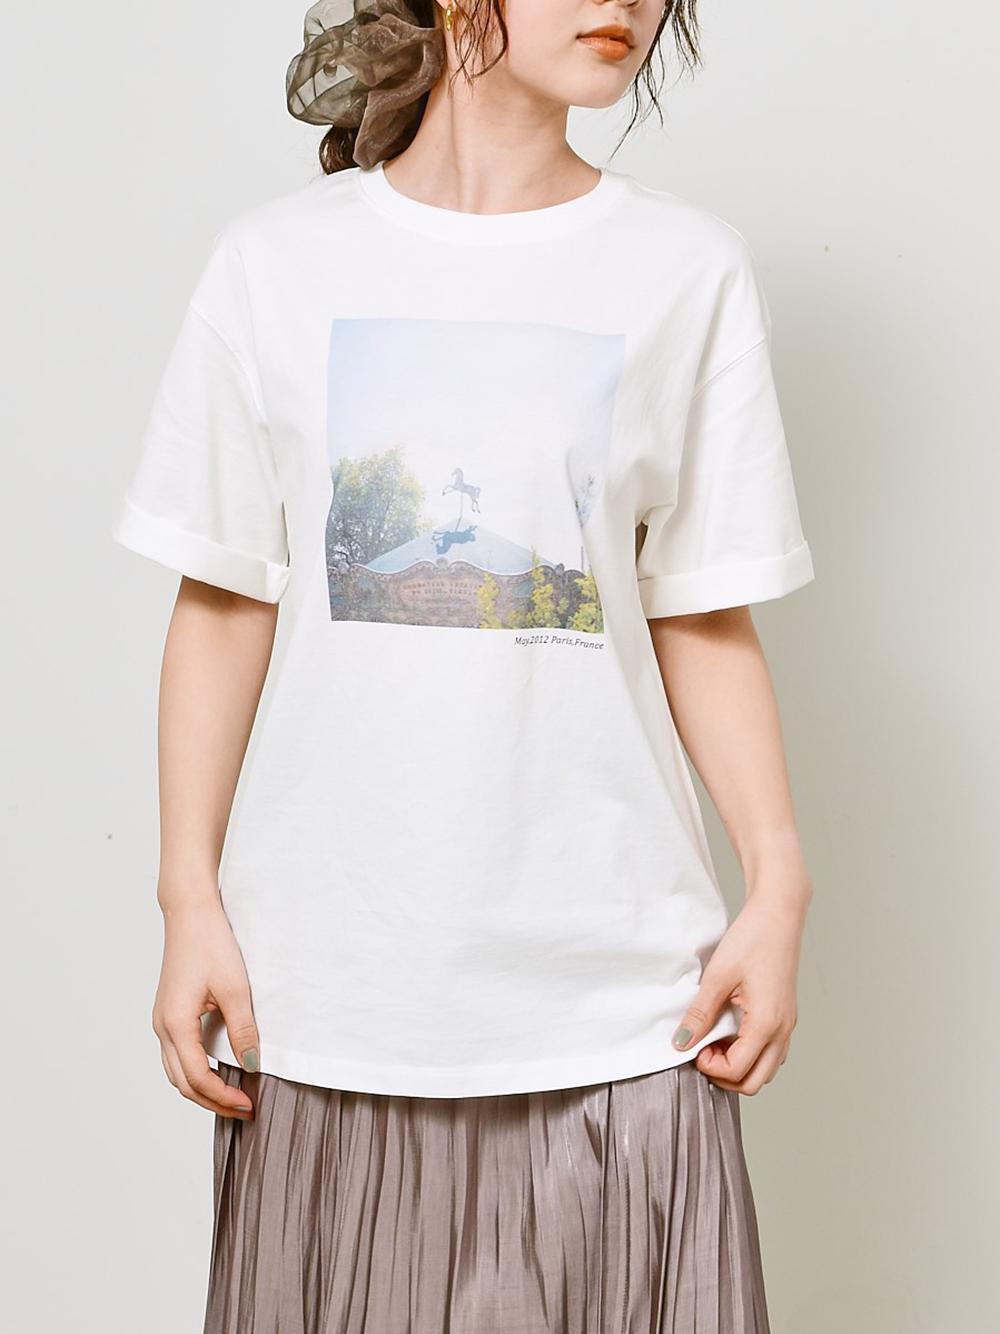 【SNIDEL meets Jun Imajo】コラボフォトTシャツ(A-F)